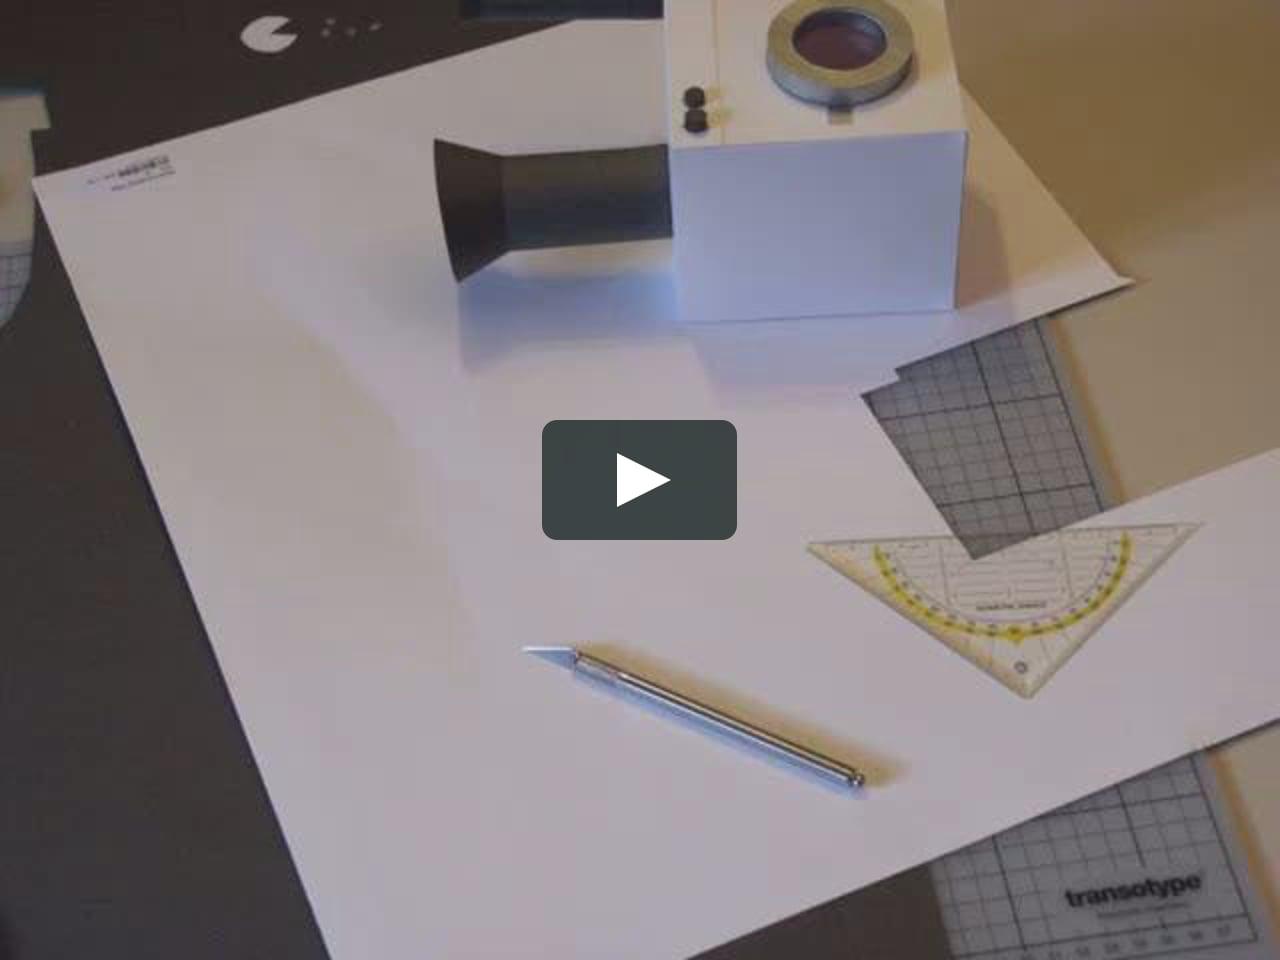 Papercraft Papercraft Wäschekorb timelapse